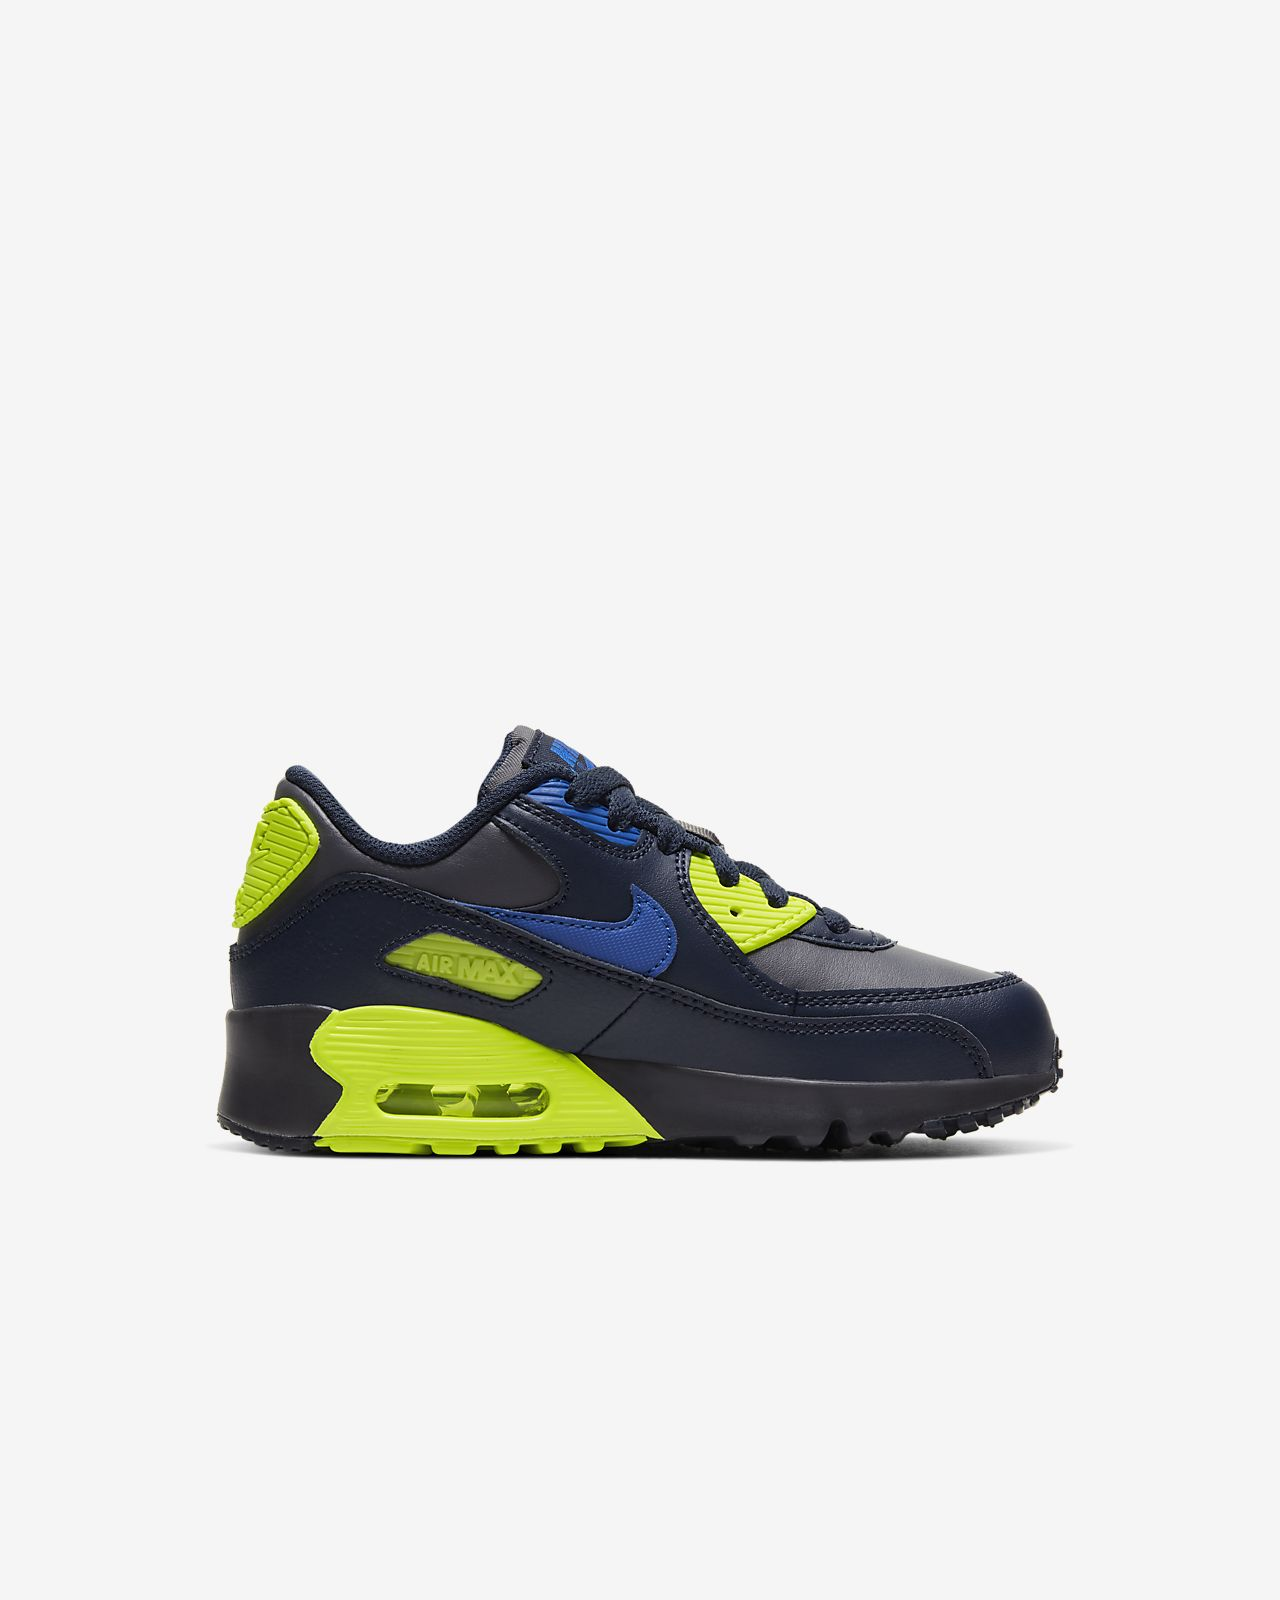 Nike Air Max 90 Leather Preschool Boys' Casual Shoe